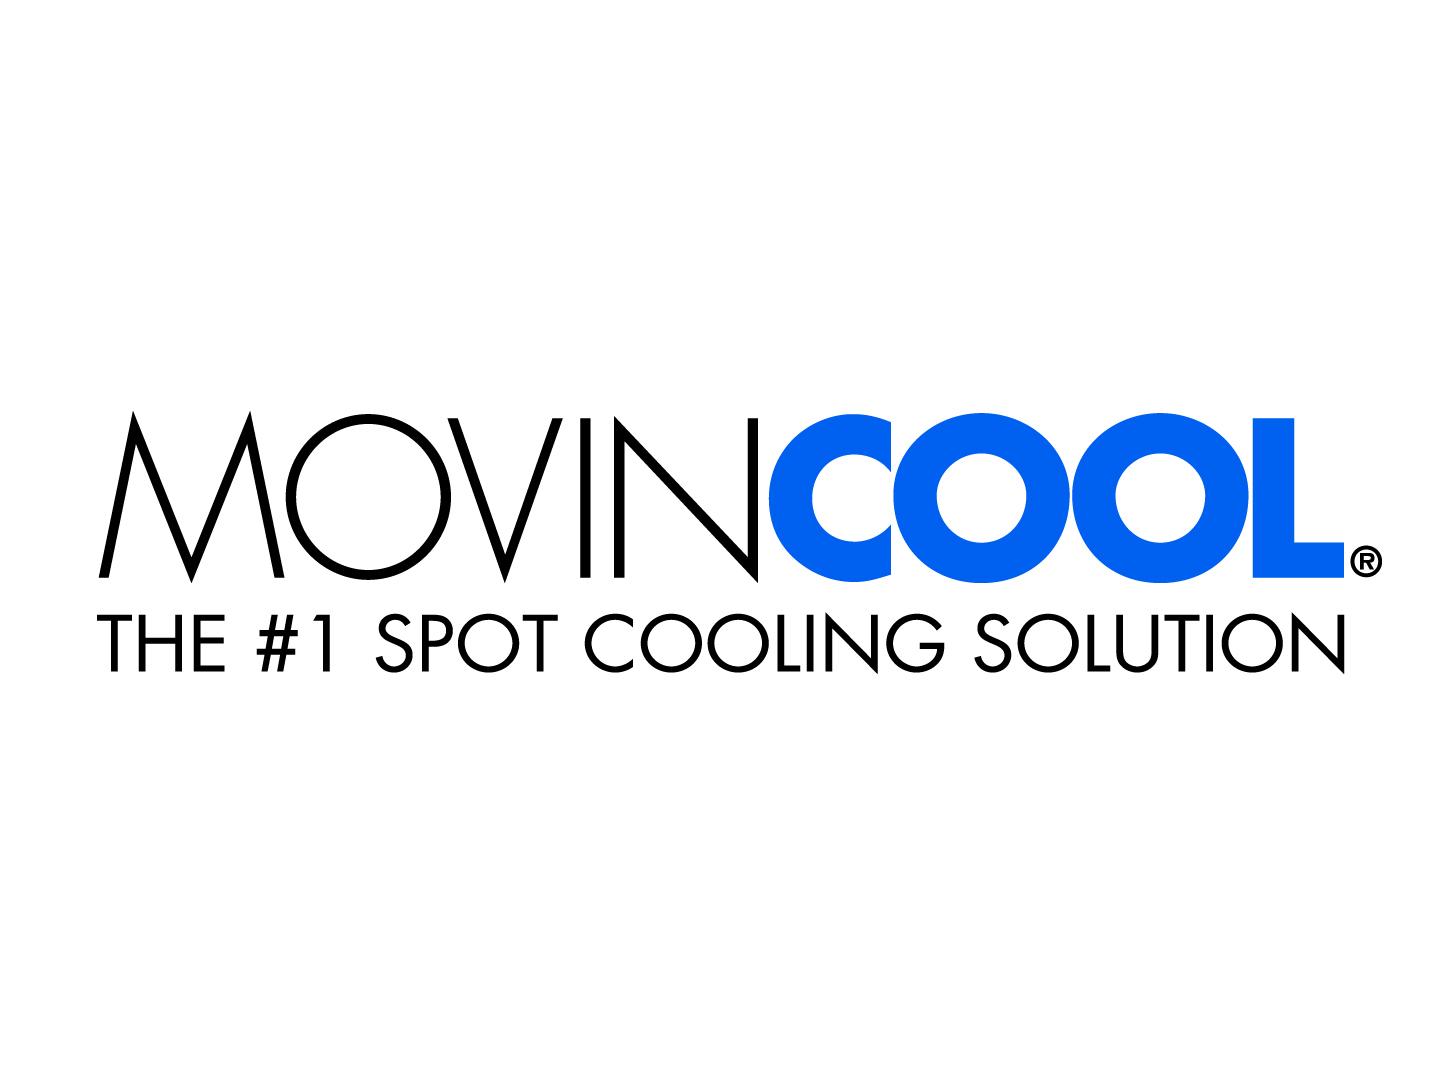 MovinCool_logo_4c.jpg